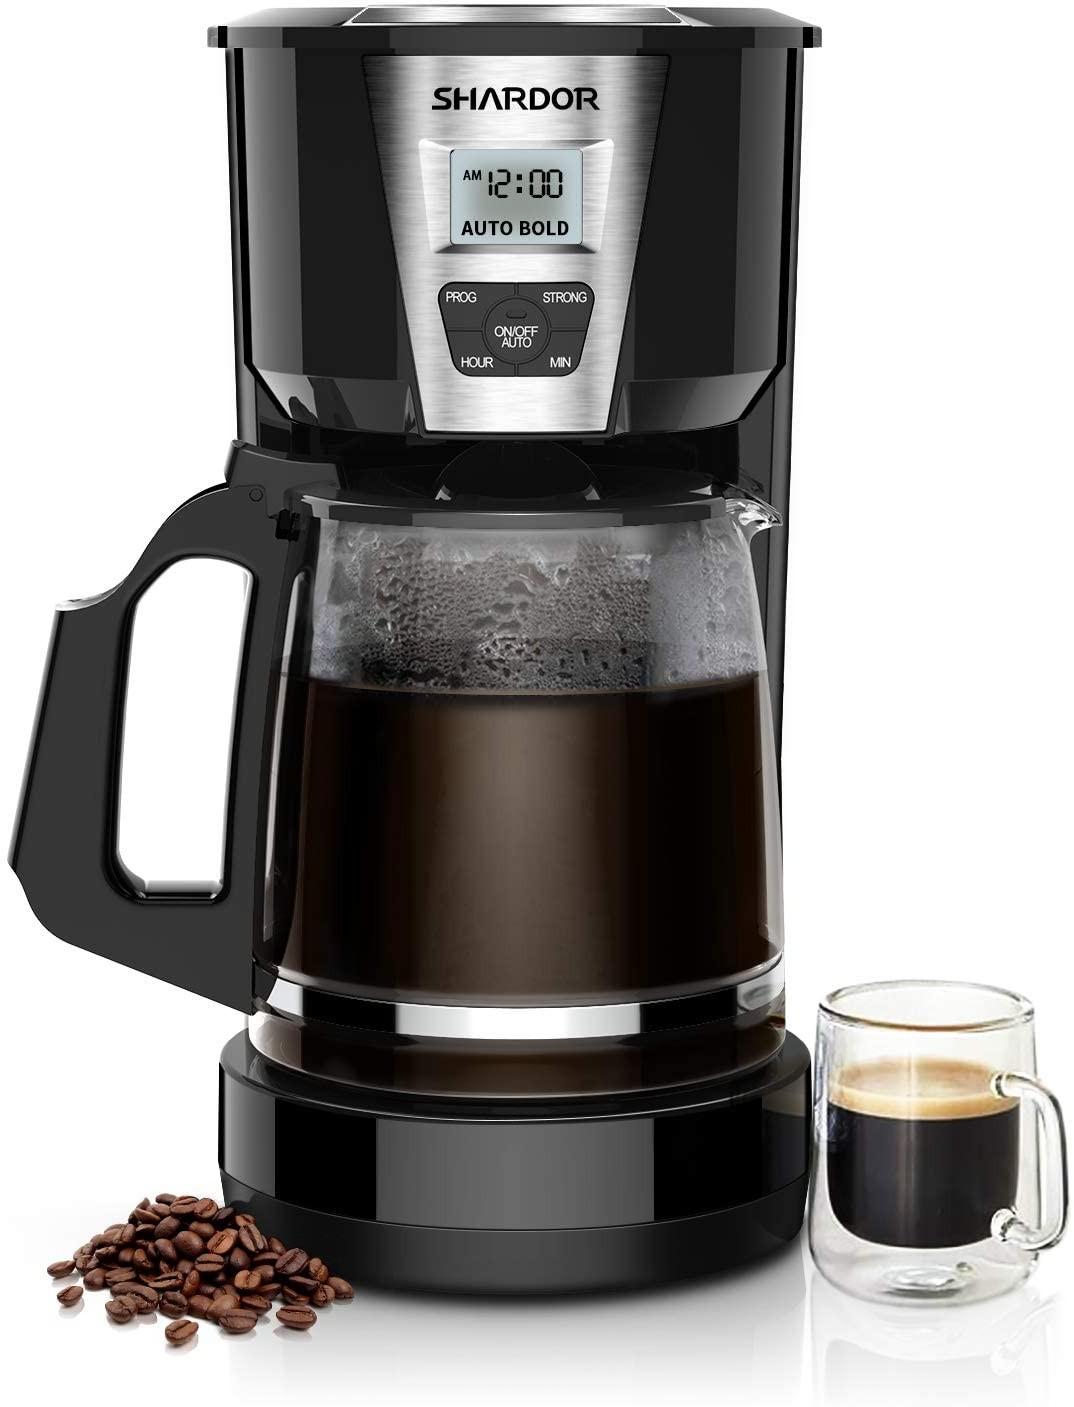 SHARDOR Drip Coffee Maker, 12-15 Cups Programmable Brew Coffee Machine 2.0, Automatic Start and Shut